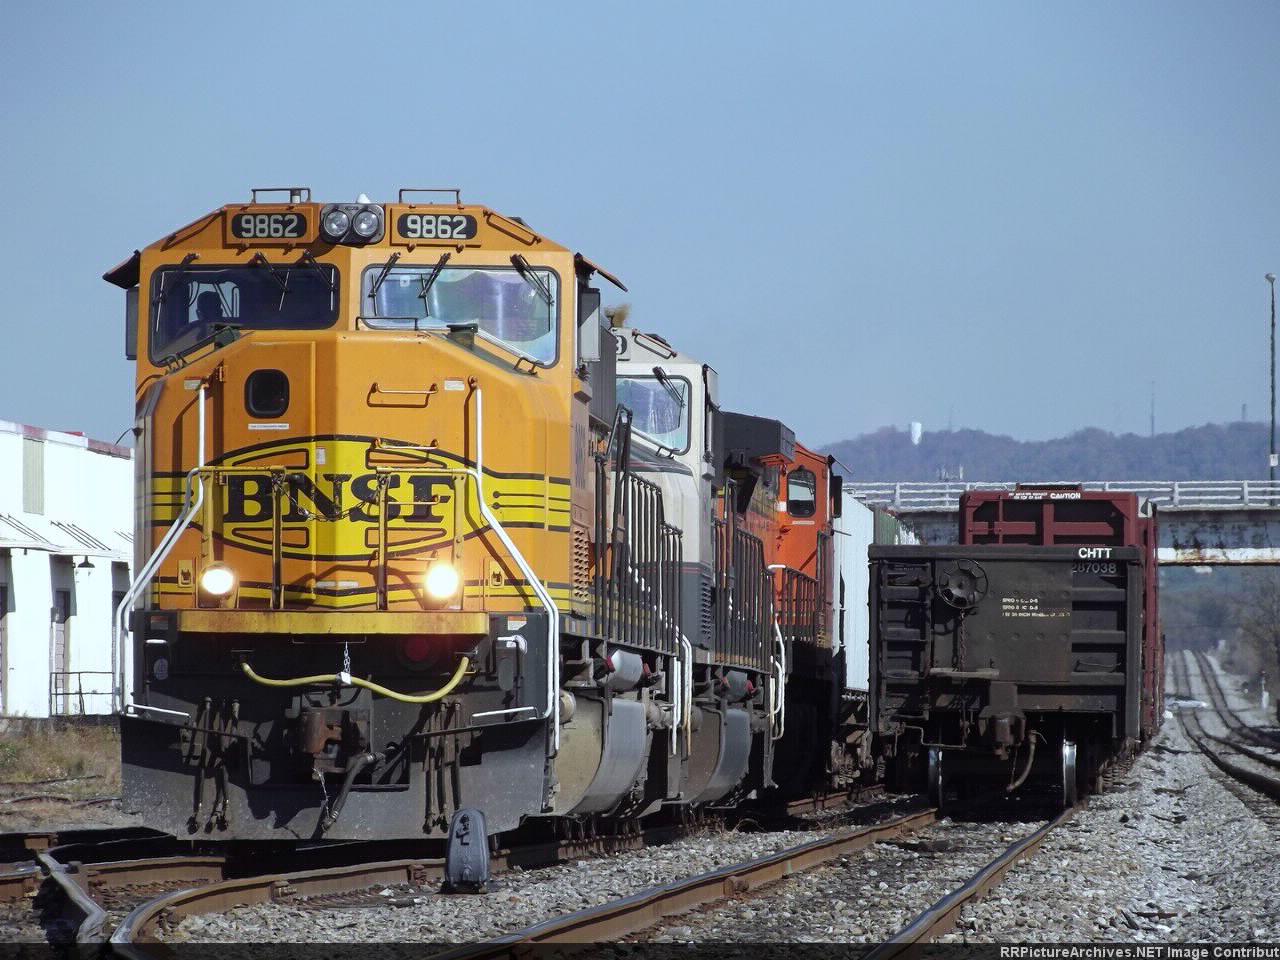 BNSF Transfer